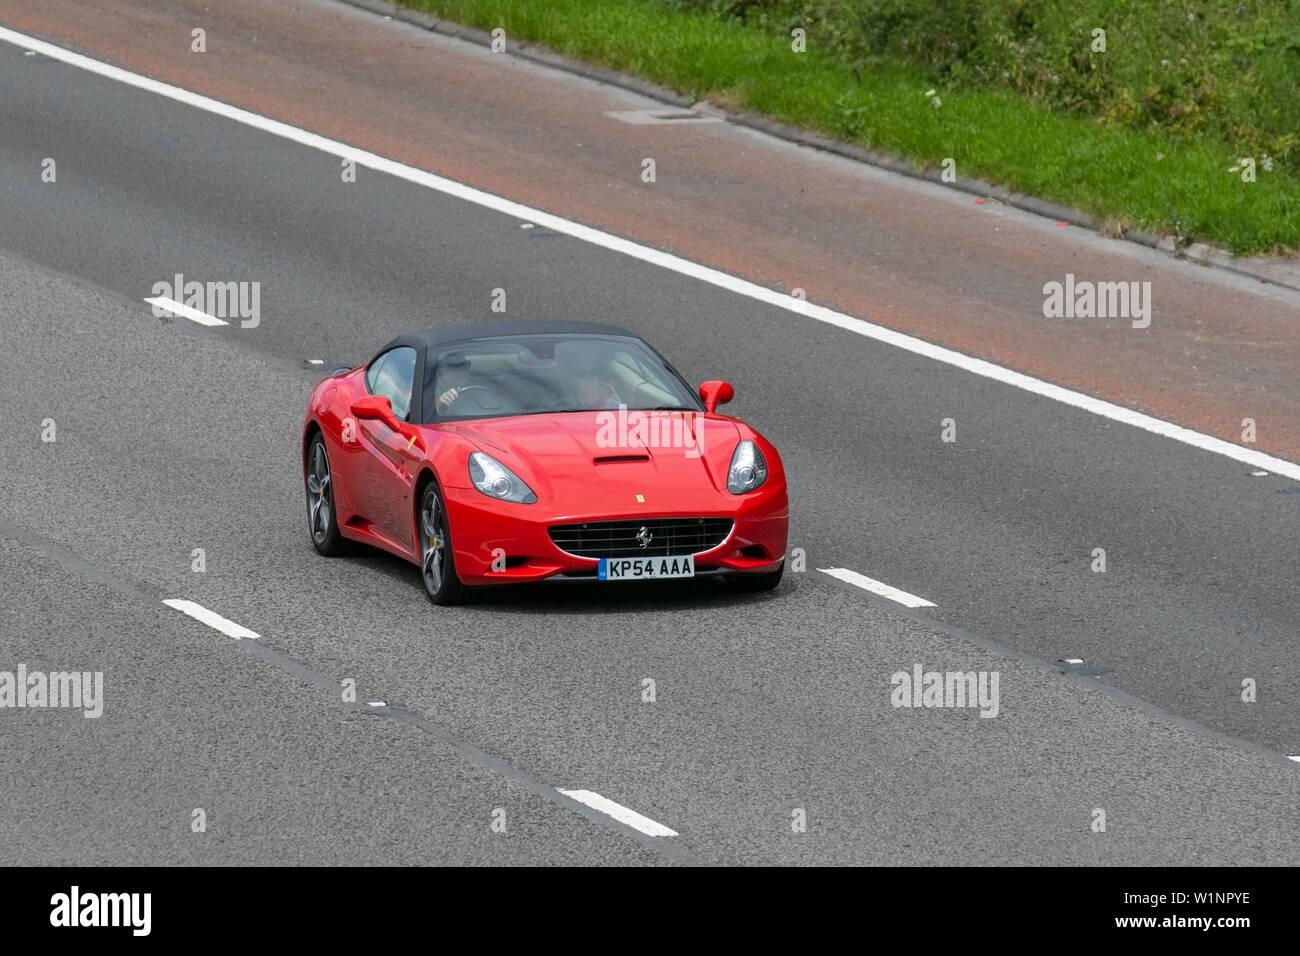 2014 Ferrari California 2 Plus 2 S-A; UK Vehicular traffic, transport, modern, saloon cars, north-bound on the 3 lane highway. - Stock Image